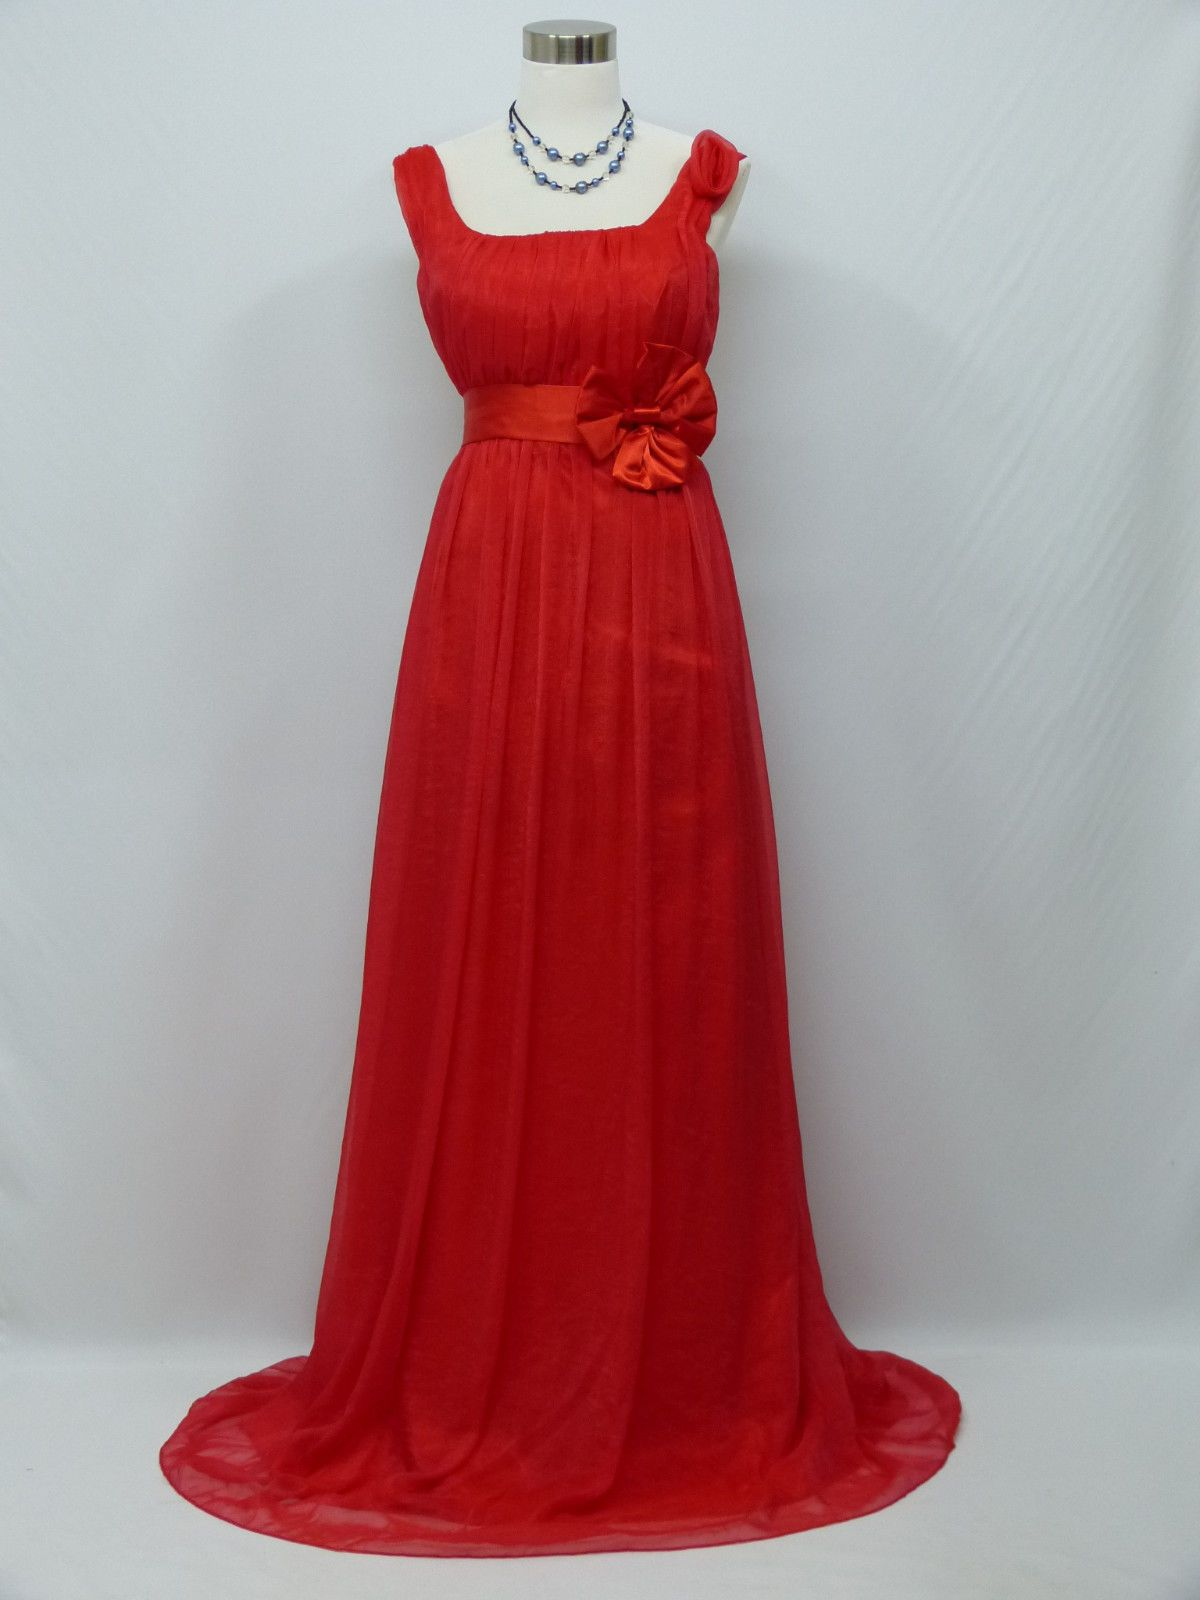 Dress for wedding evening party  Cherlone Plus Size Chiffon Red Ballgown Bridesmaid Wedding Evening